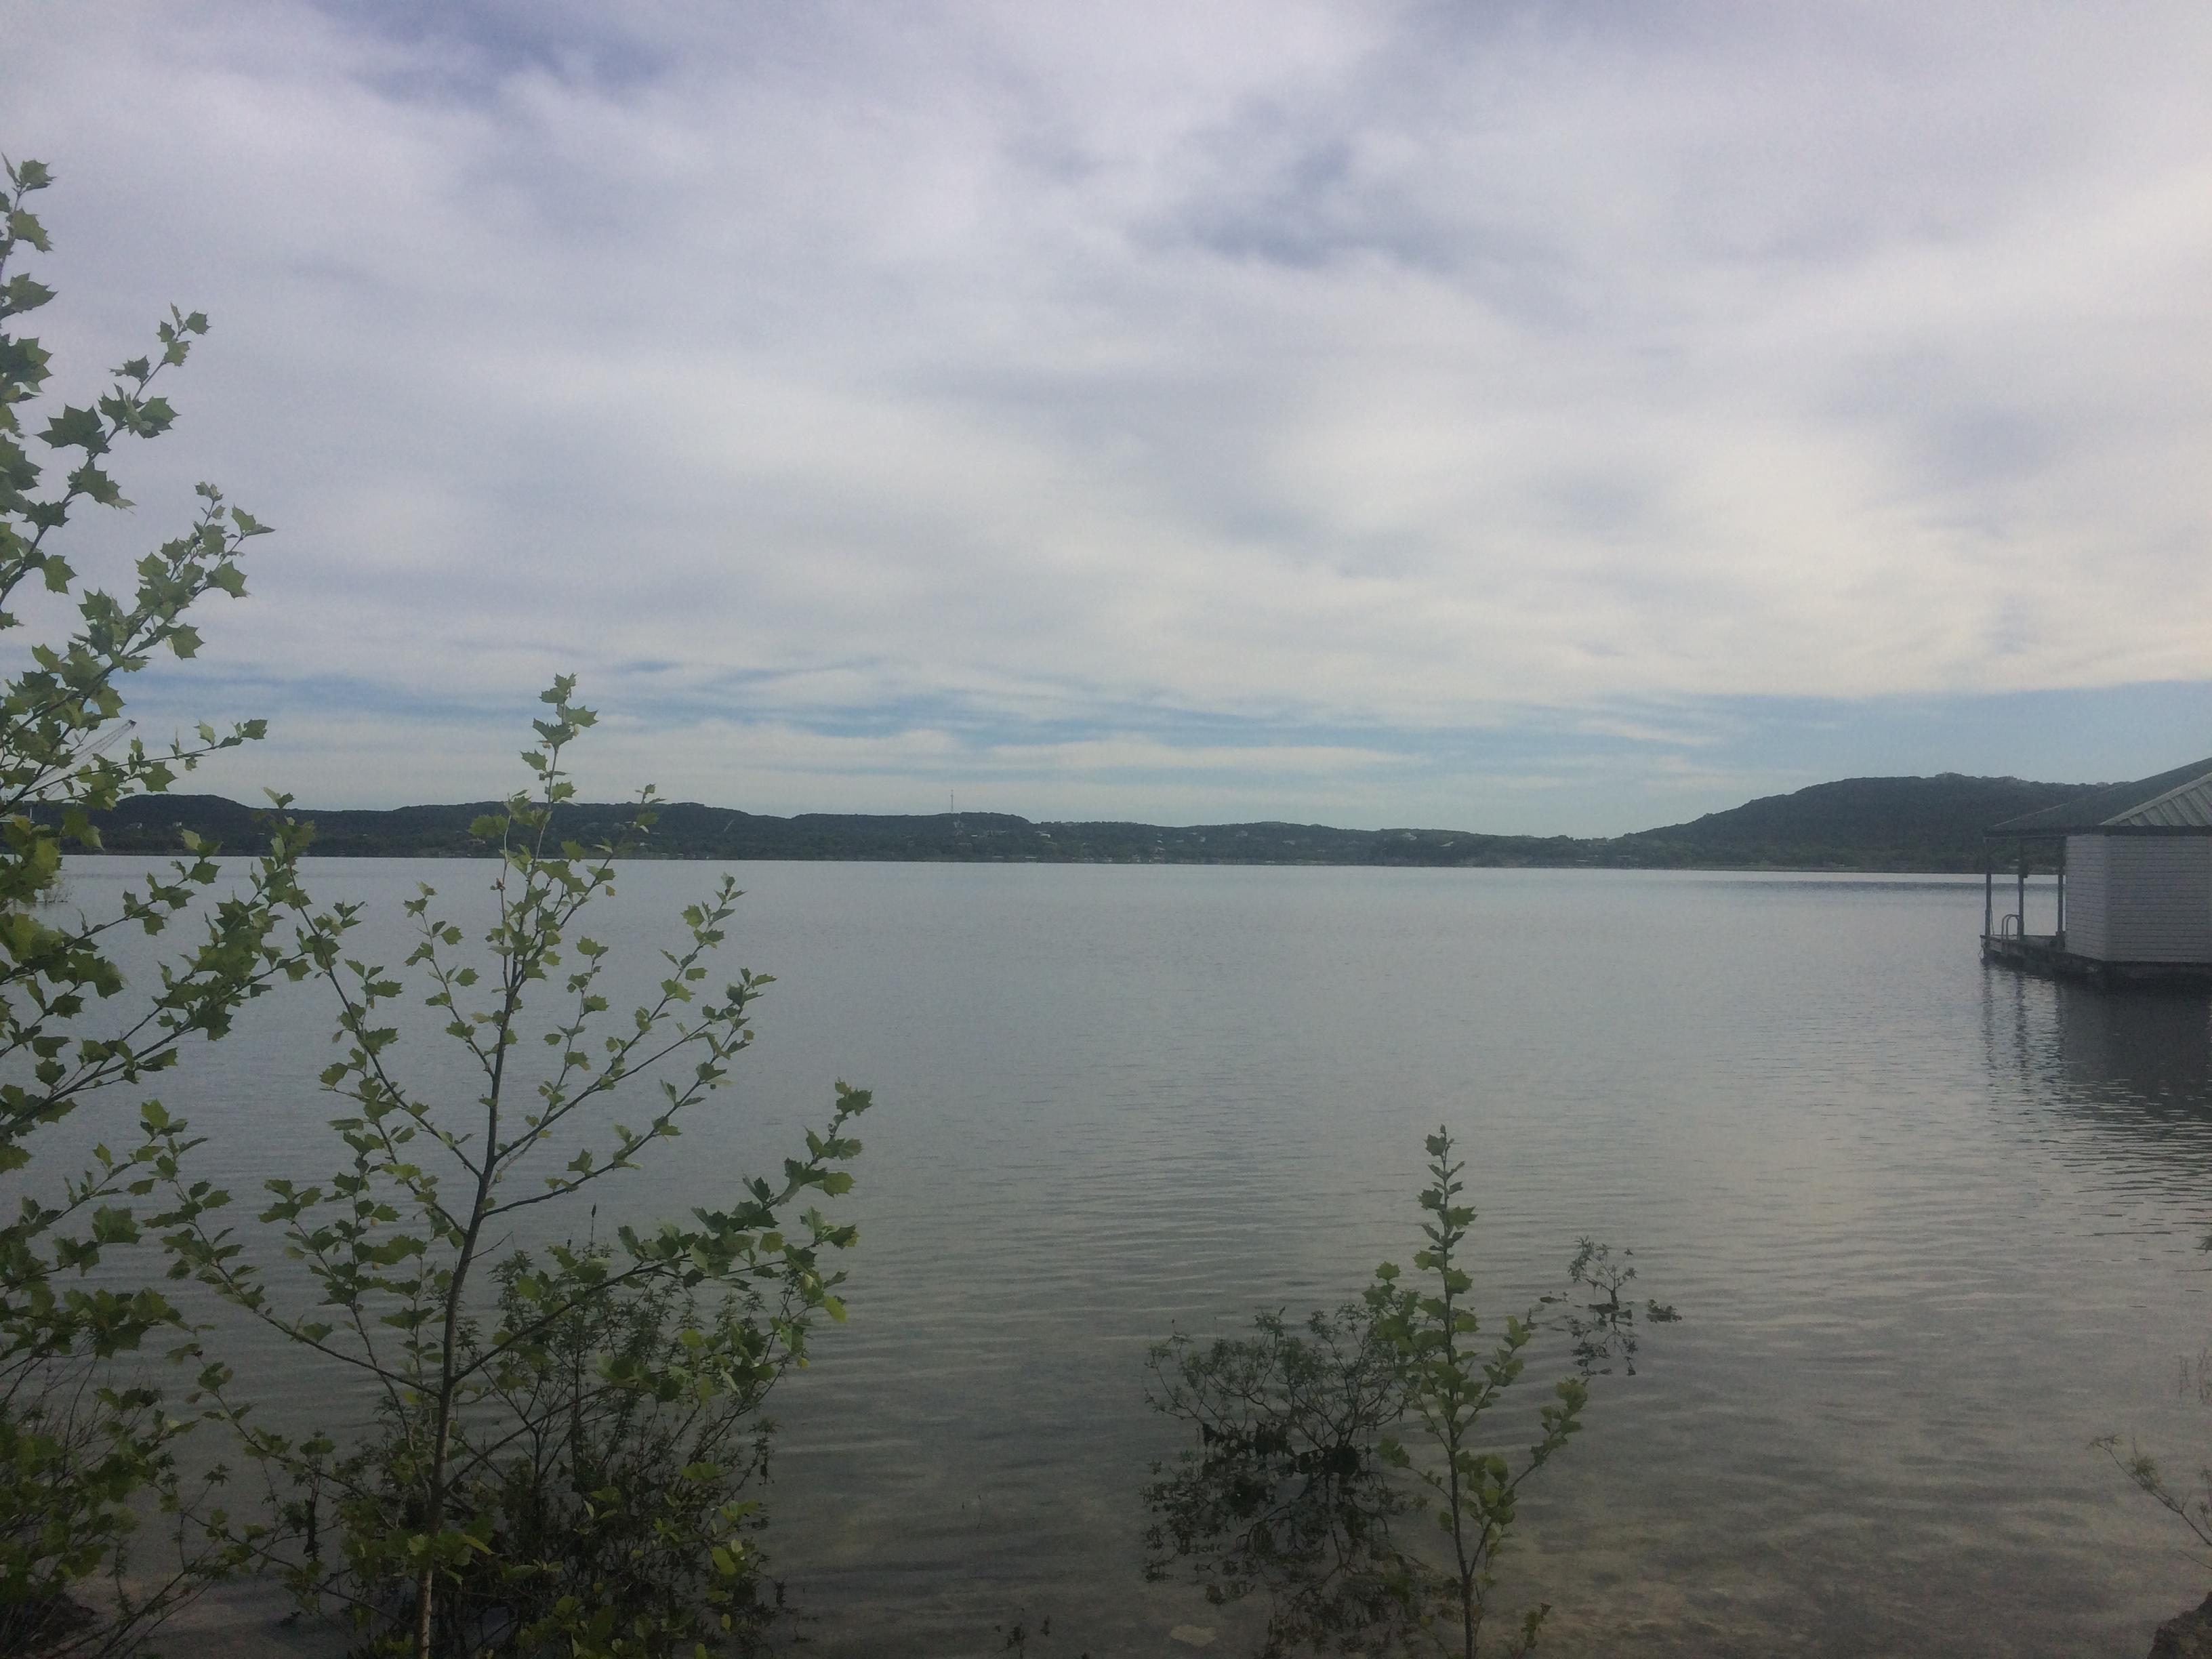 Lake Travis Waterfront Homes | Lori Wakefield REALTOR | Keller Williams Lake Travis